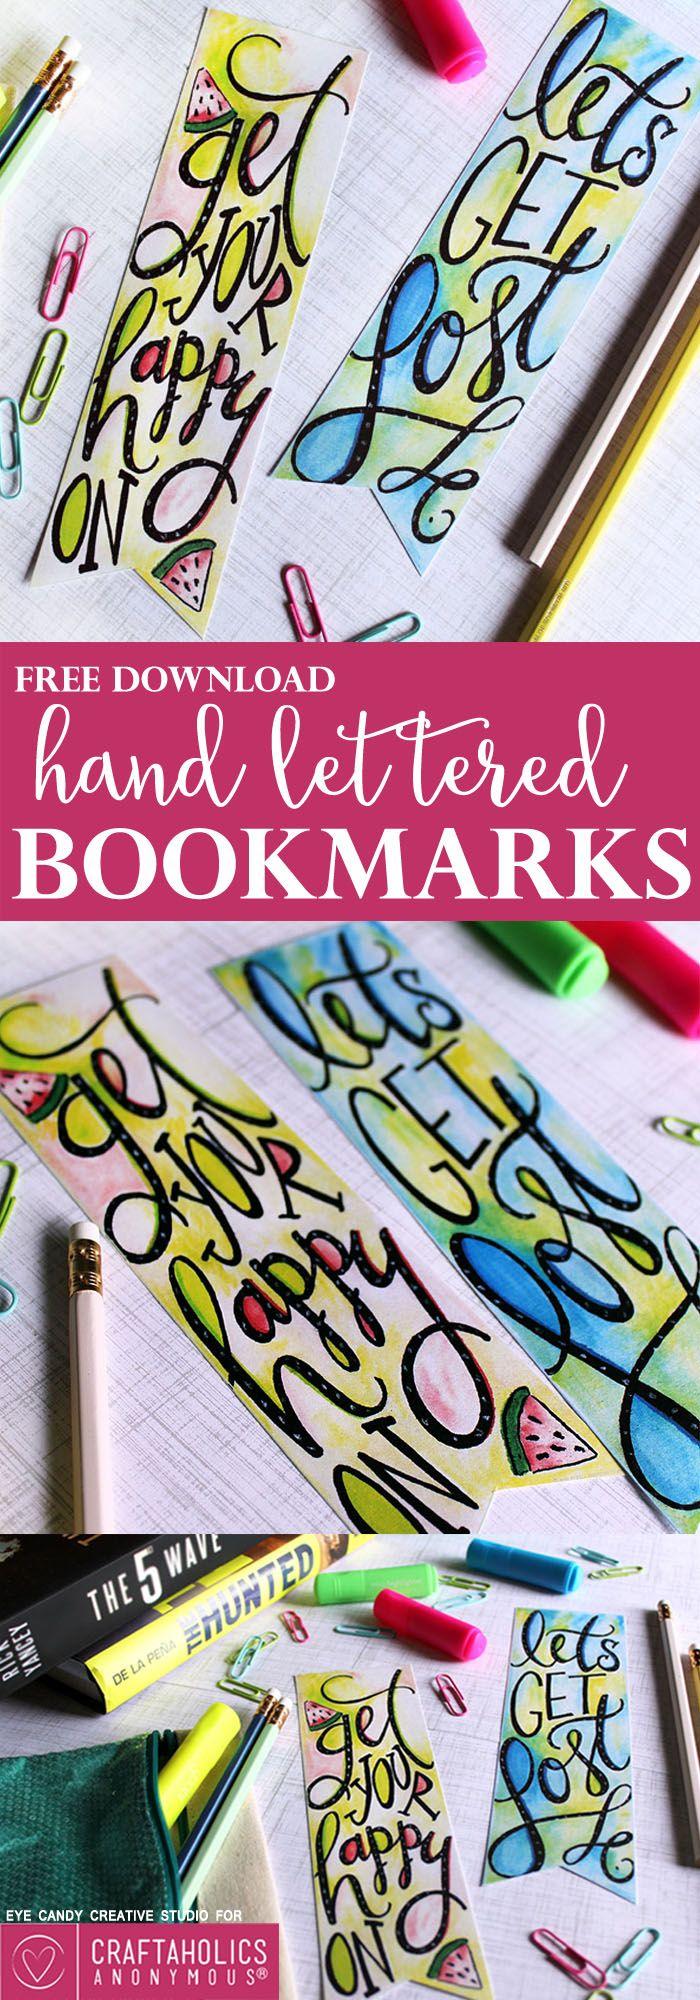 best 25 printable bookmarks ideas on pinterest printable book